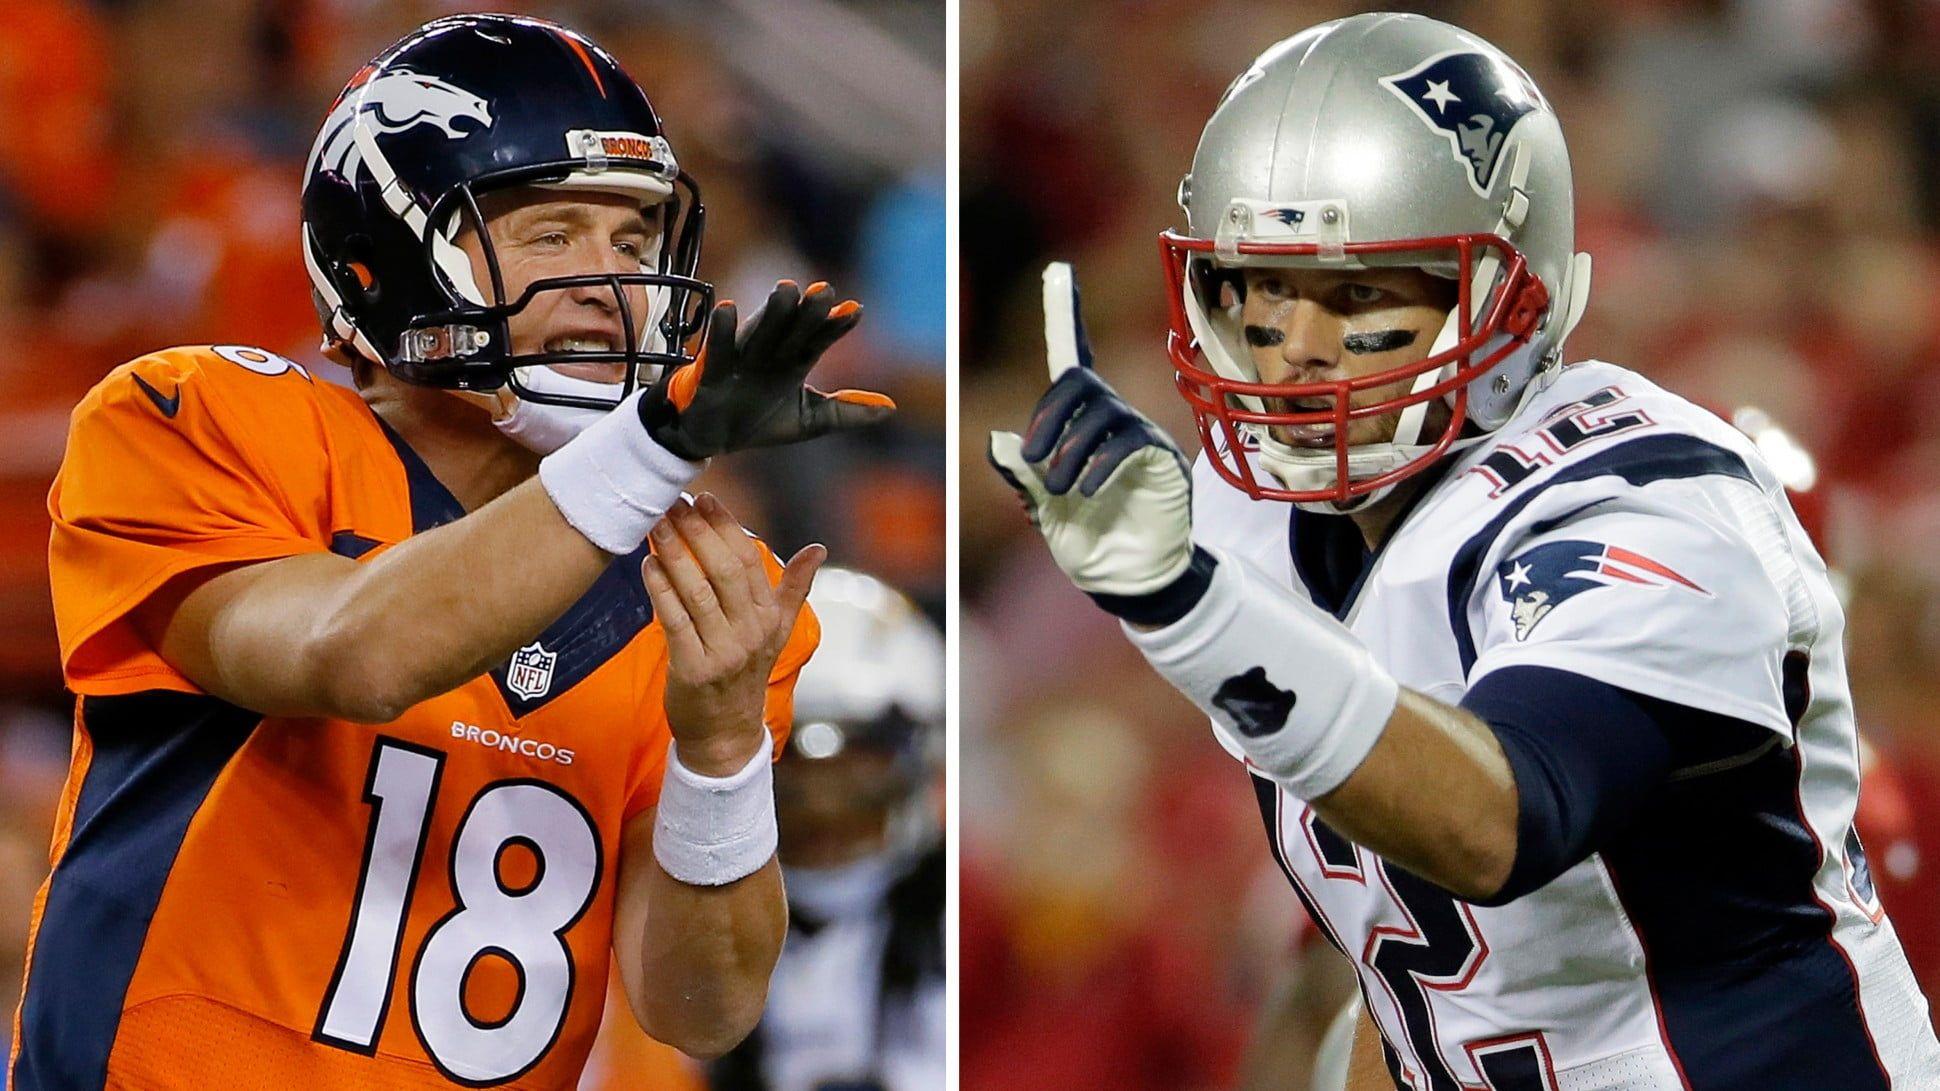 Broncos vs Pats